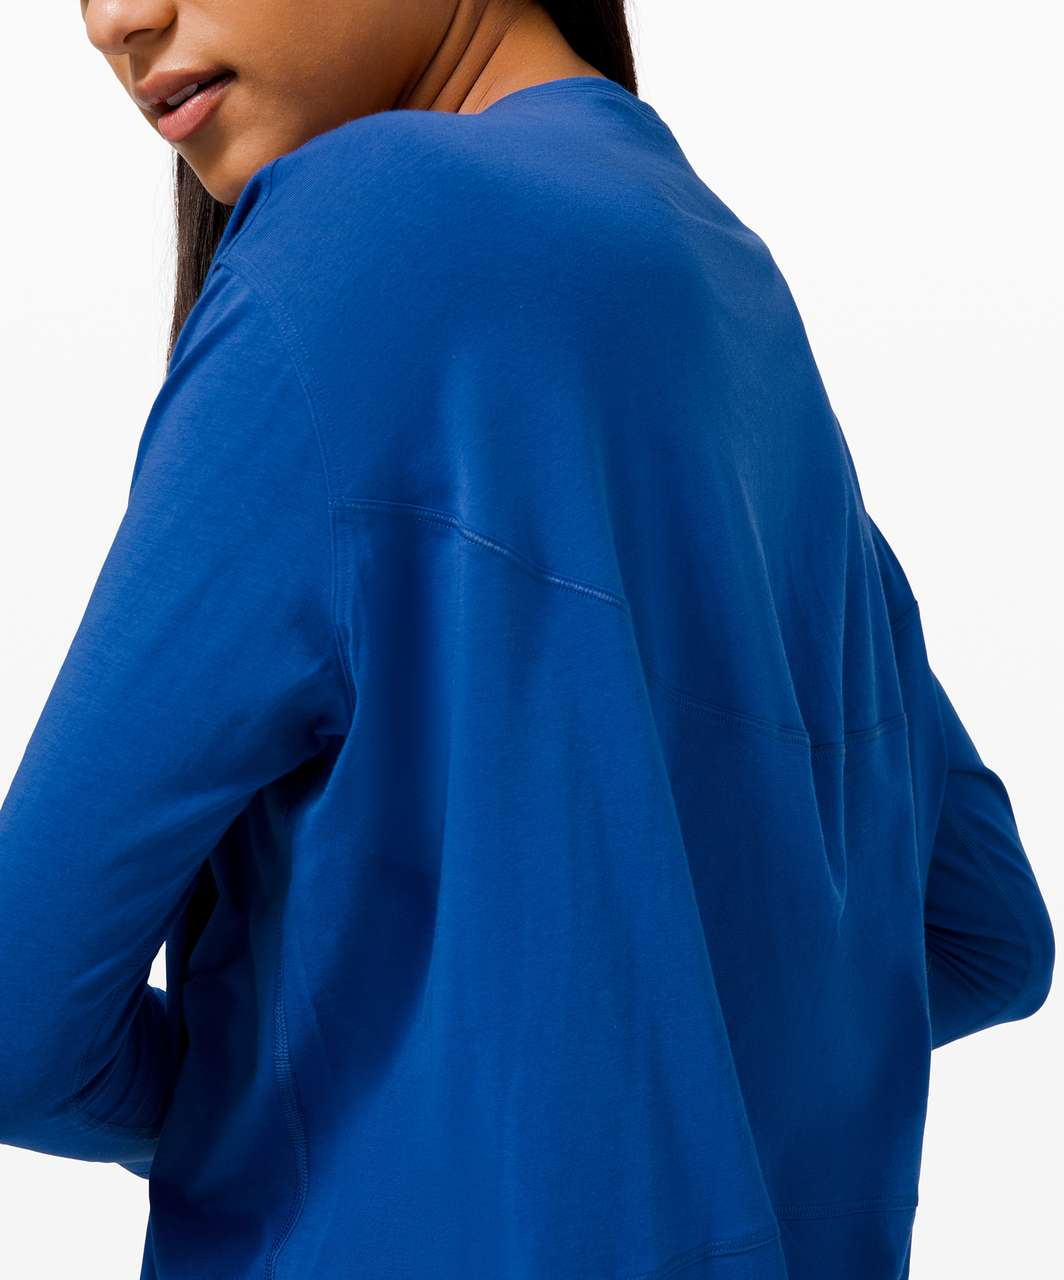 Lululemon Back In Action Long Sleeve - Regatta Blue